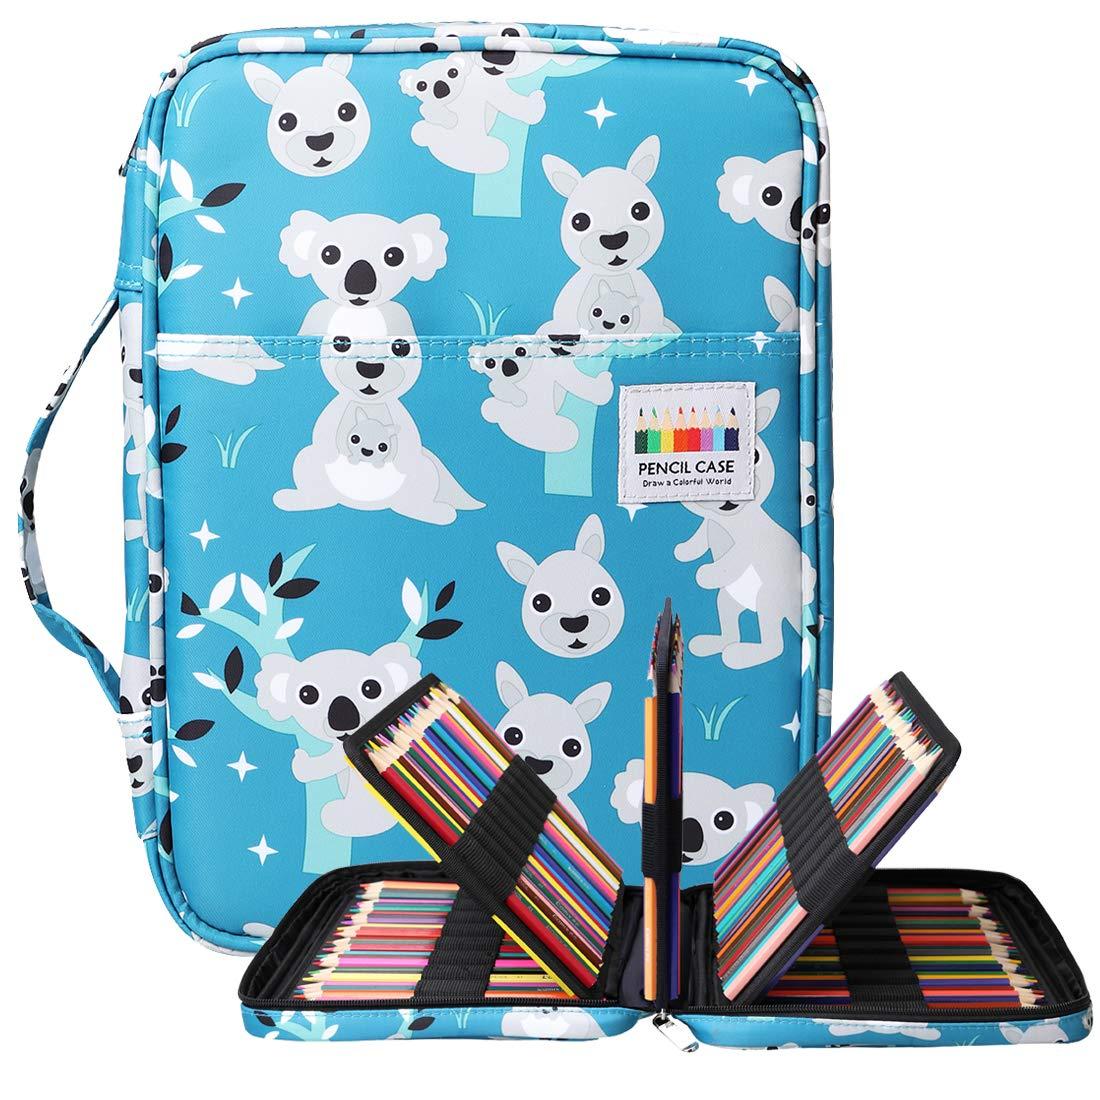 BOMKEE 220 ranuras estuche de lápices de colores, impermeable bolsa para dibujar, pintar, almacenamiento de papelería multicapa bolígrafos de gel organizador(Kangaroo): Amazon.es: Oficina y papelería